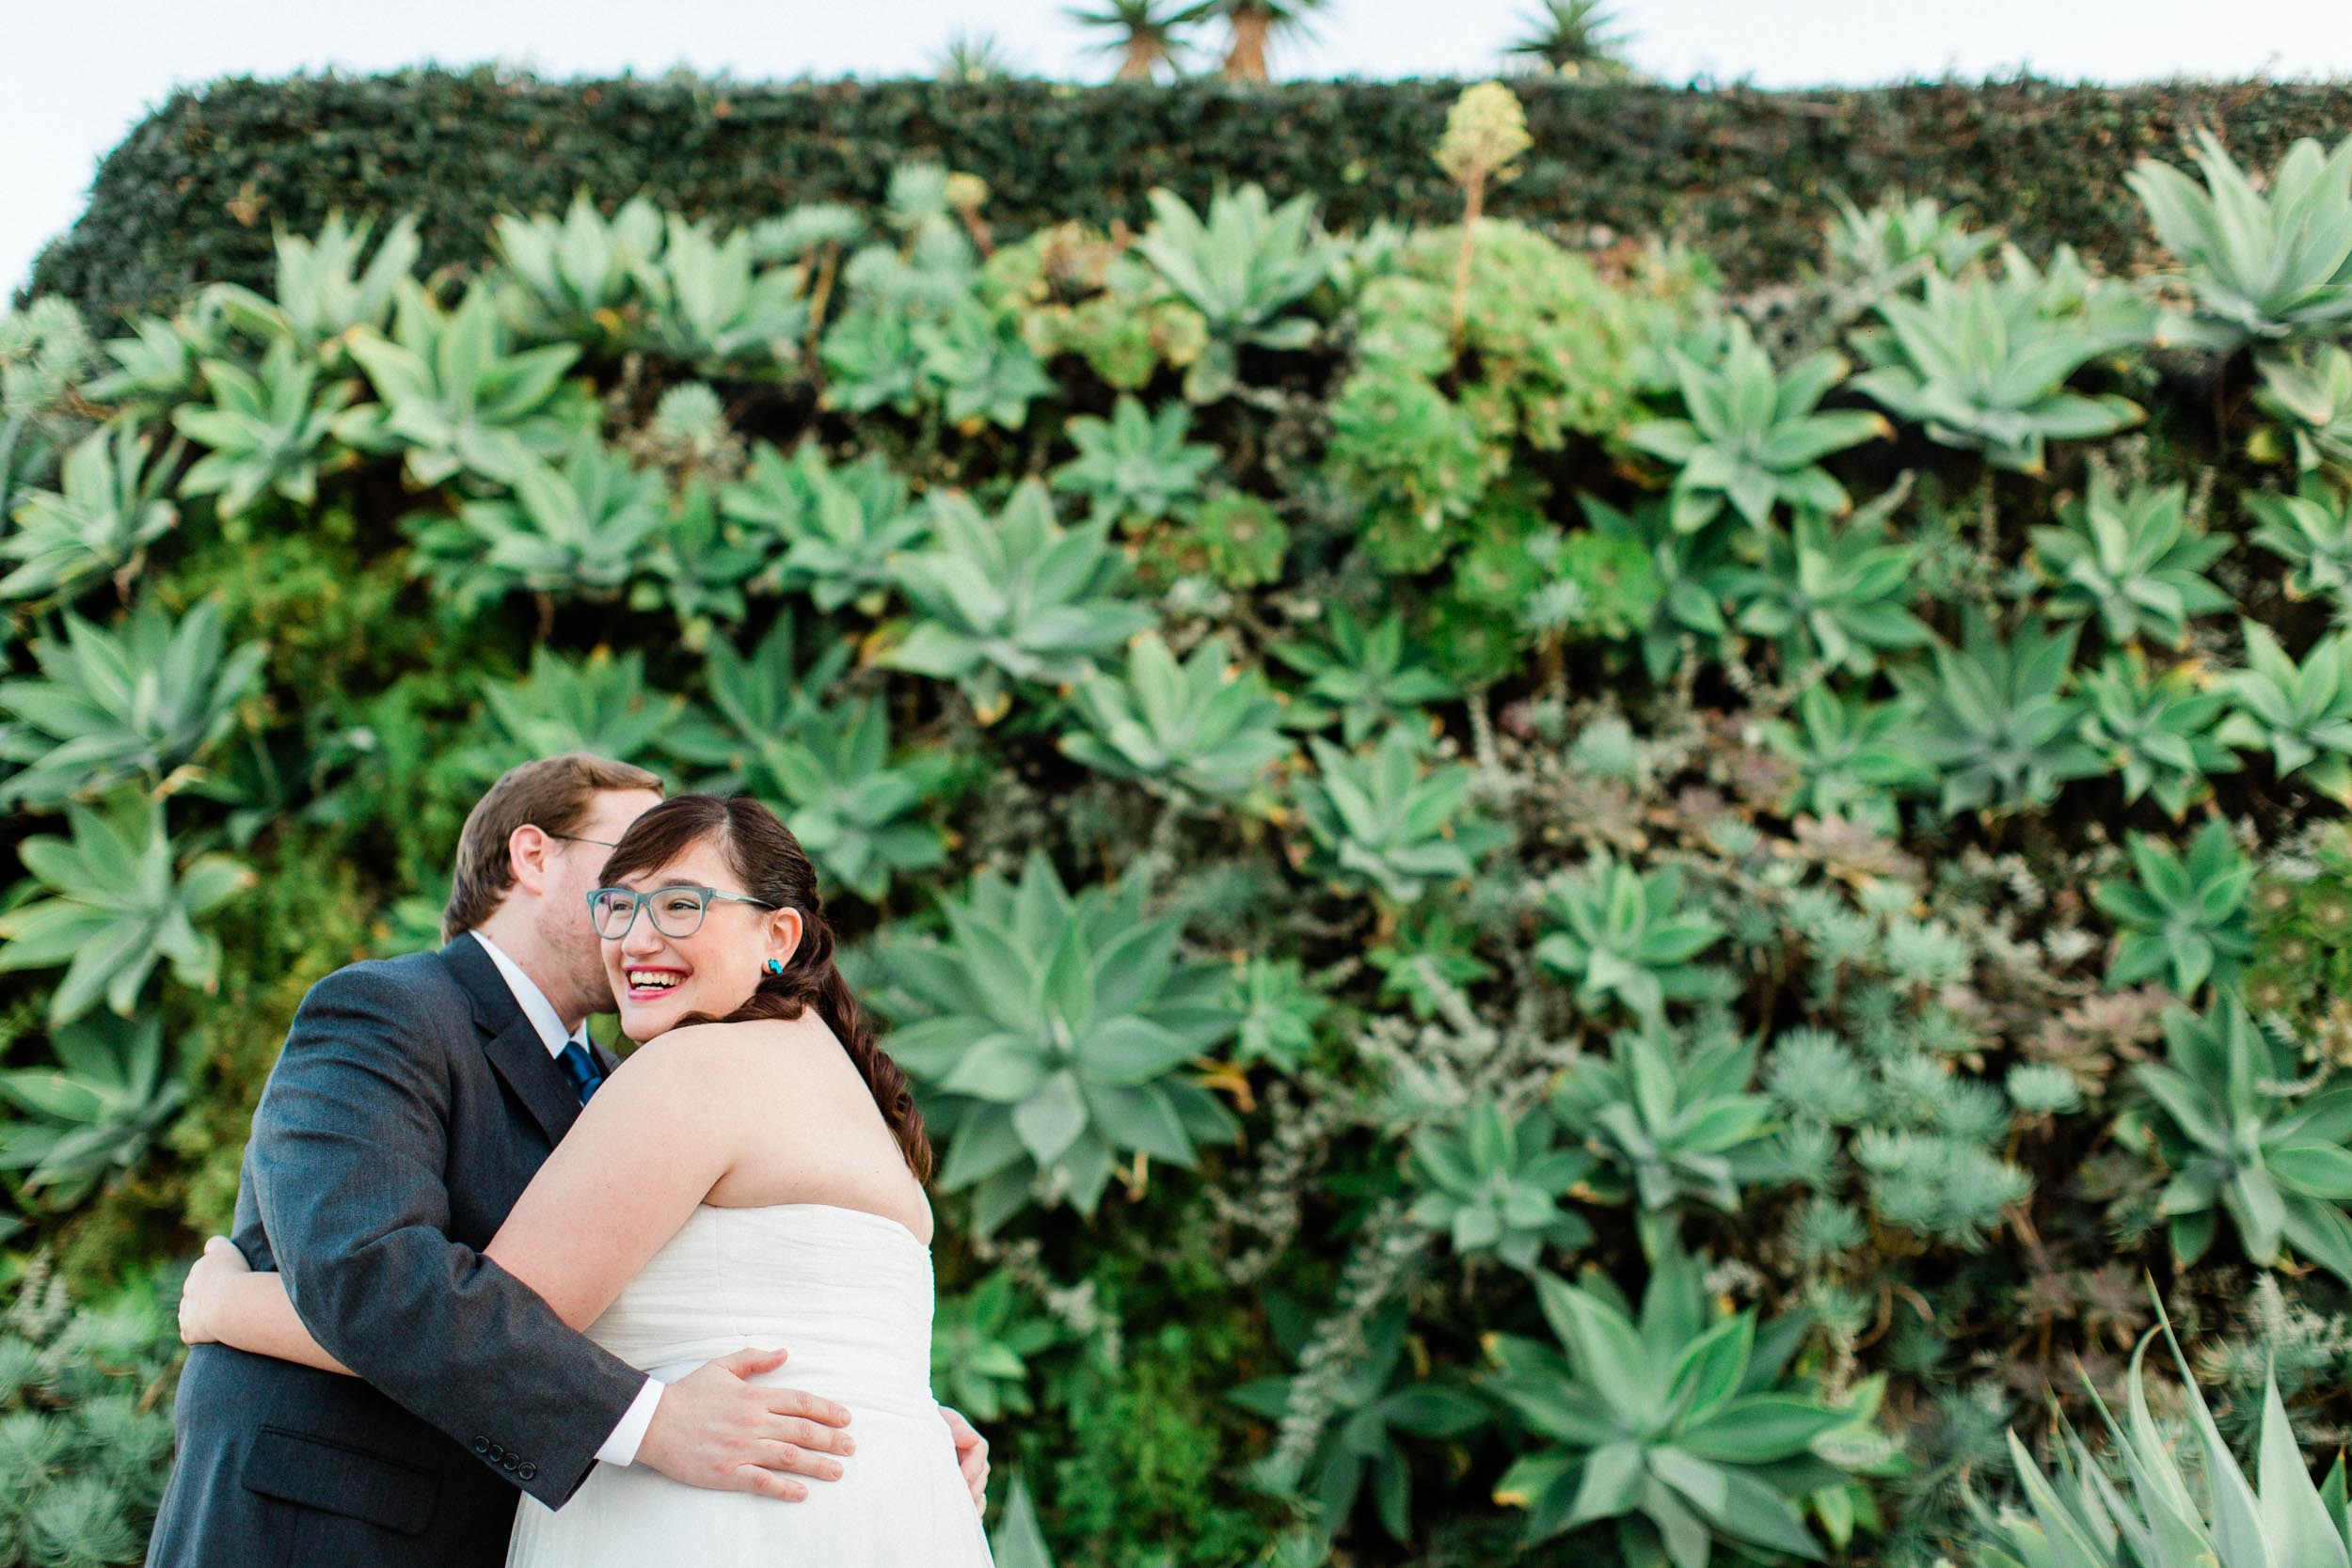 BKM-Photography-Smog-Shoppe-Culver-City-Wedding-Photographer-Culver-Hotel-0049.jpg